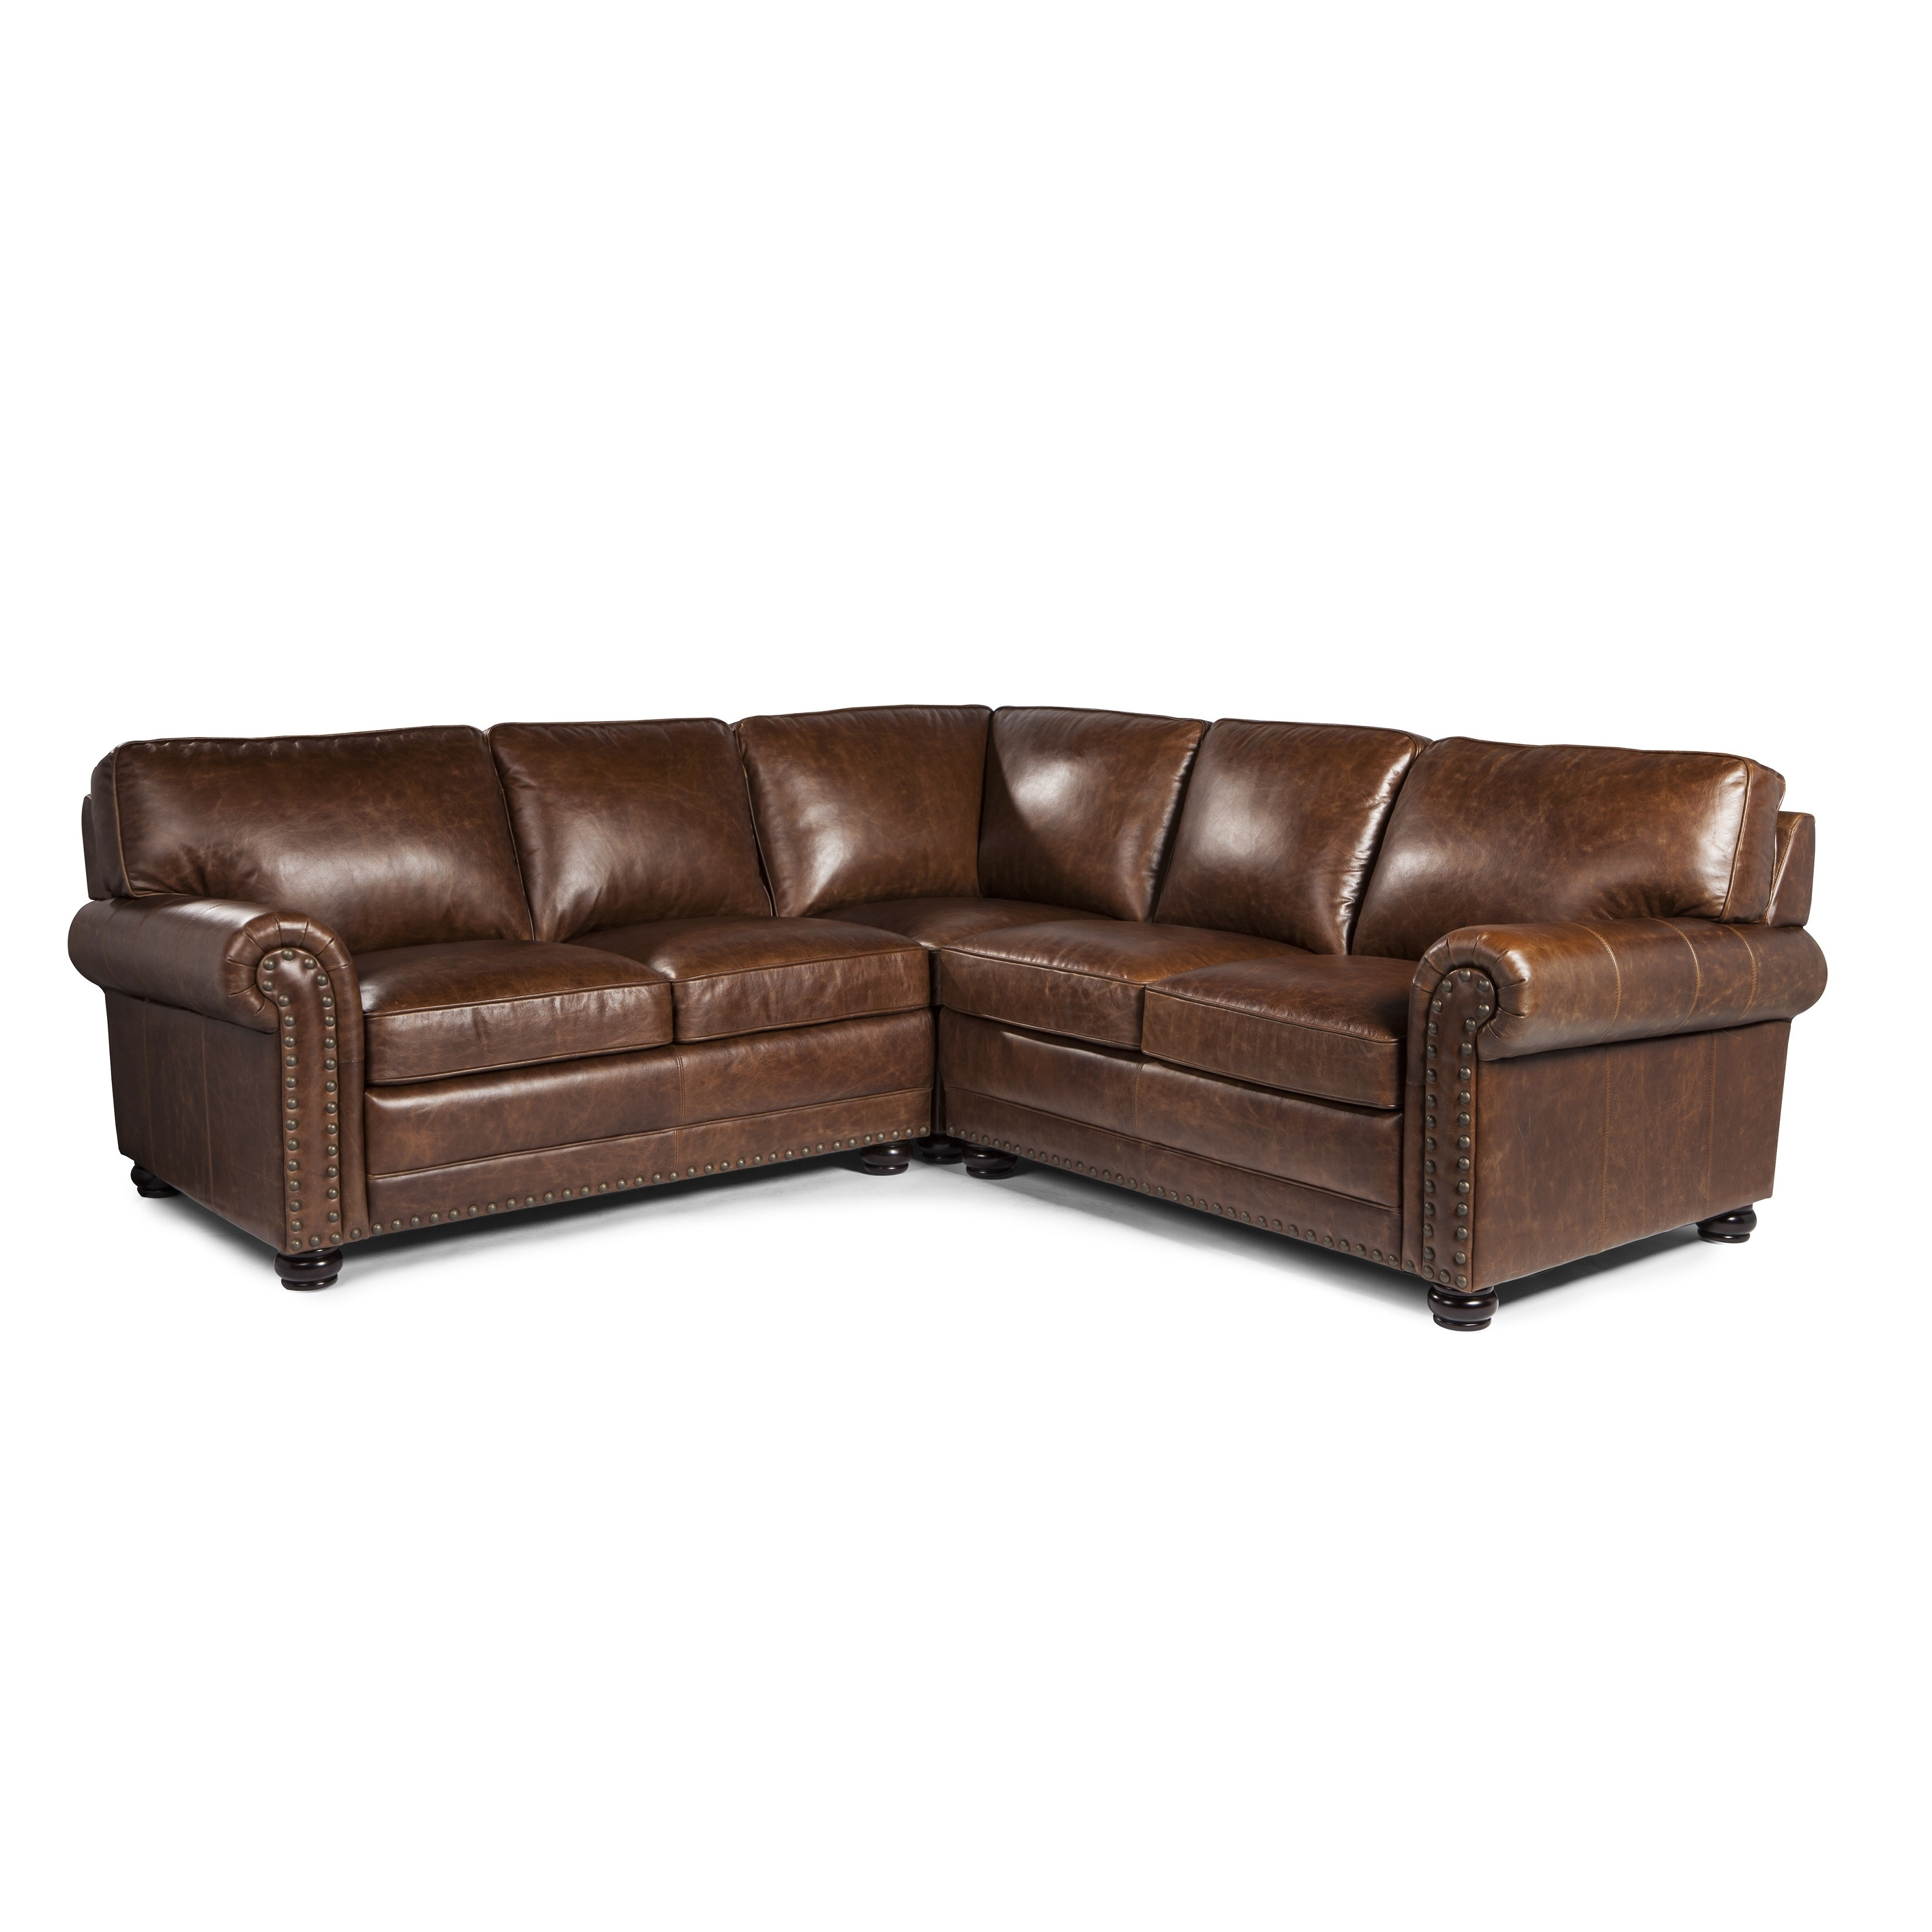 Phenomenal Genesis Cocoa Brompton Leather Sofa Sectional By Lazzaro Leather Inzonedesignstudio Interior Chair Design Inzonedesignstudiocom